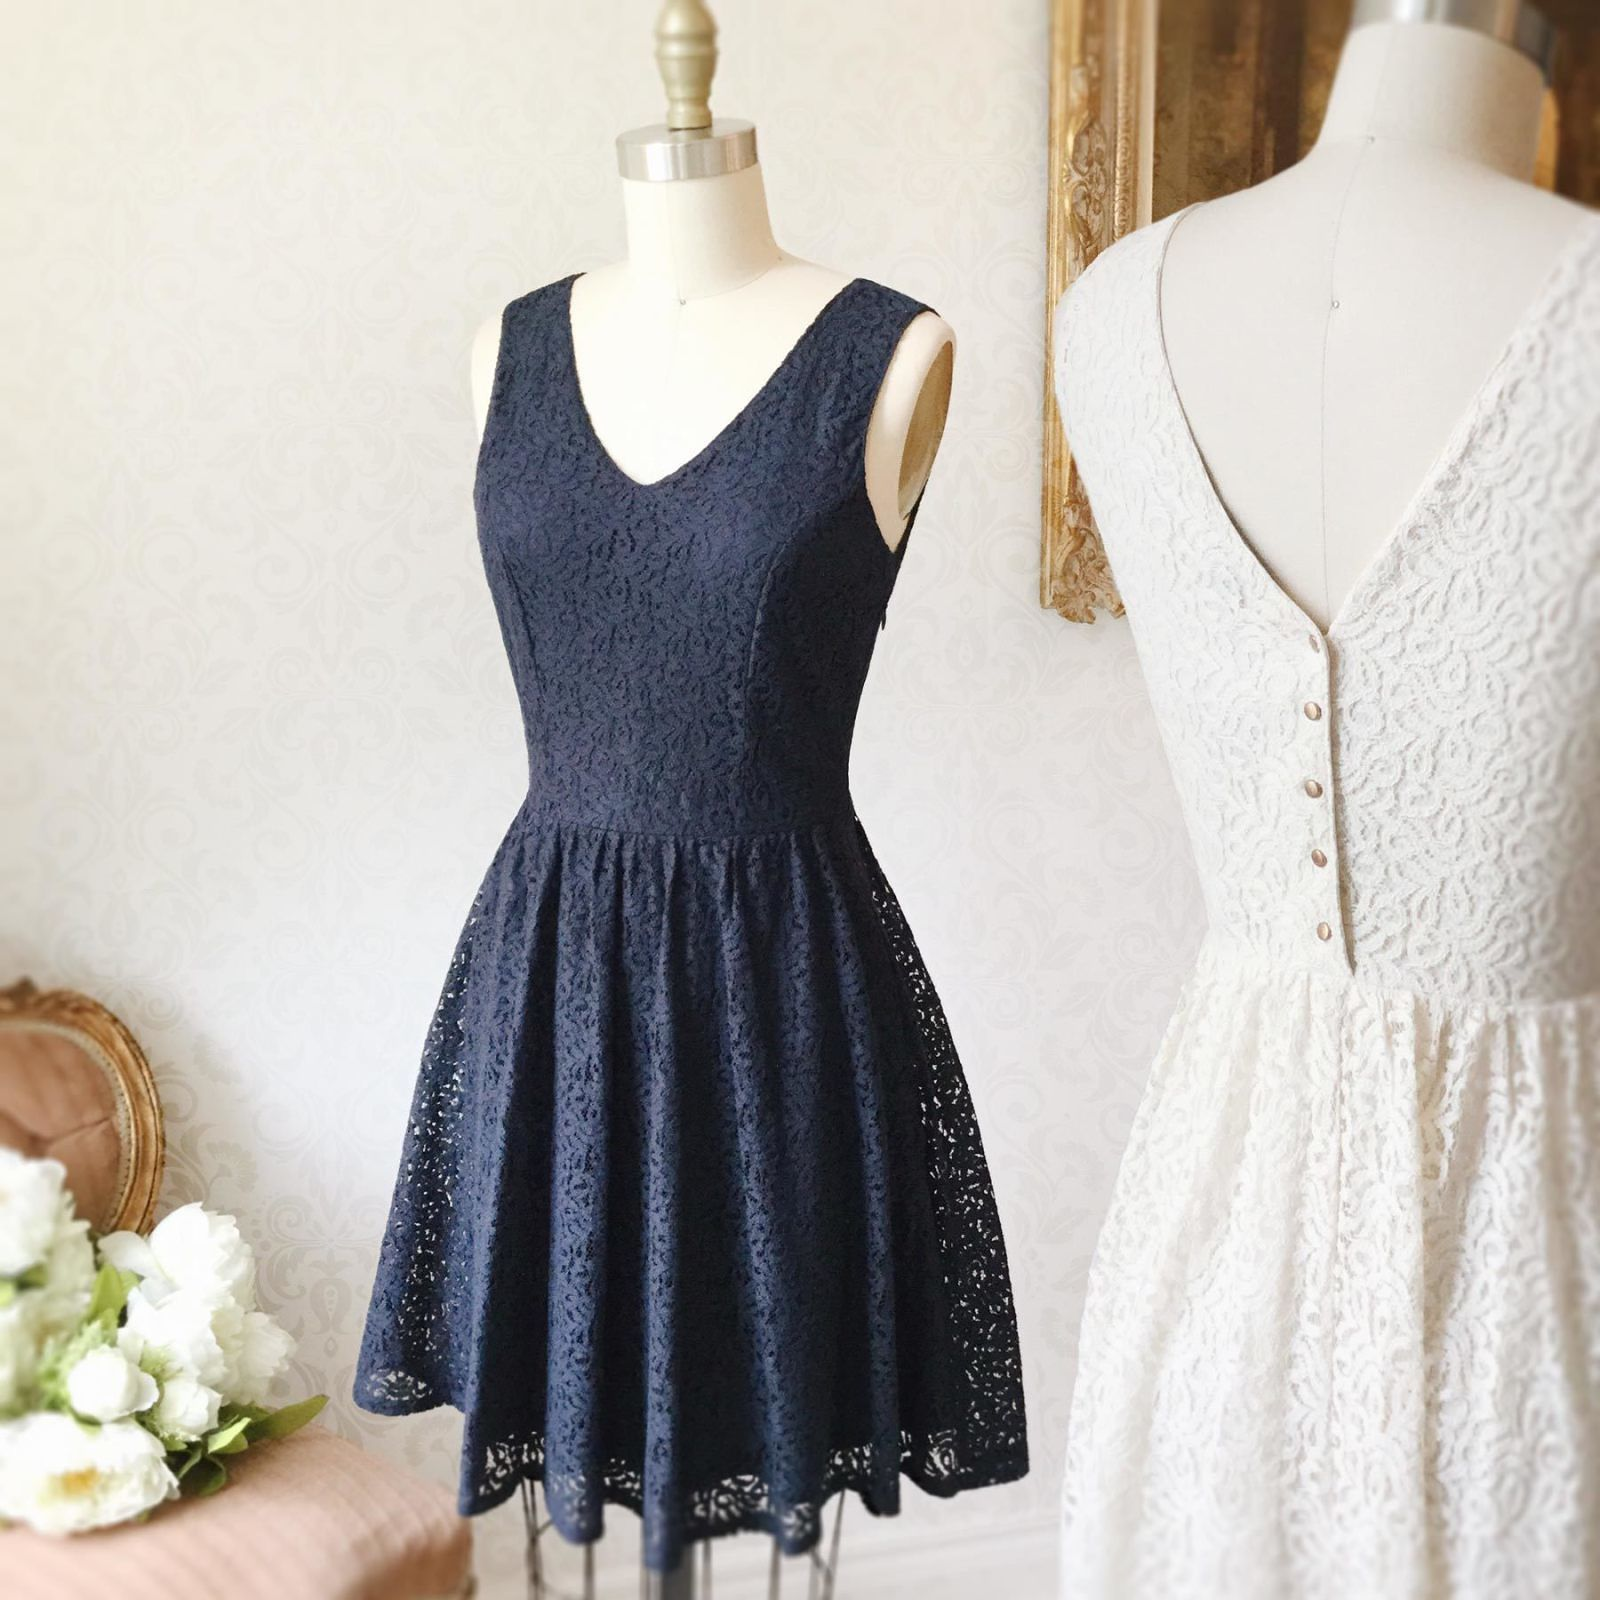 Fashion, Dress Skirt, Fancy Skirts